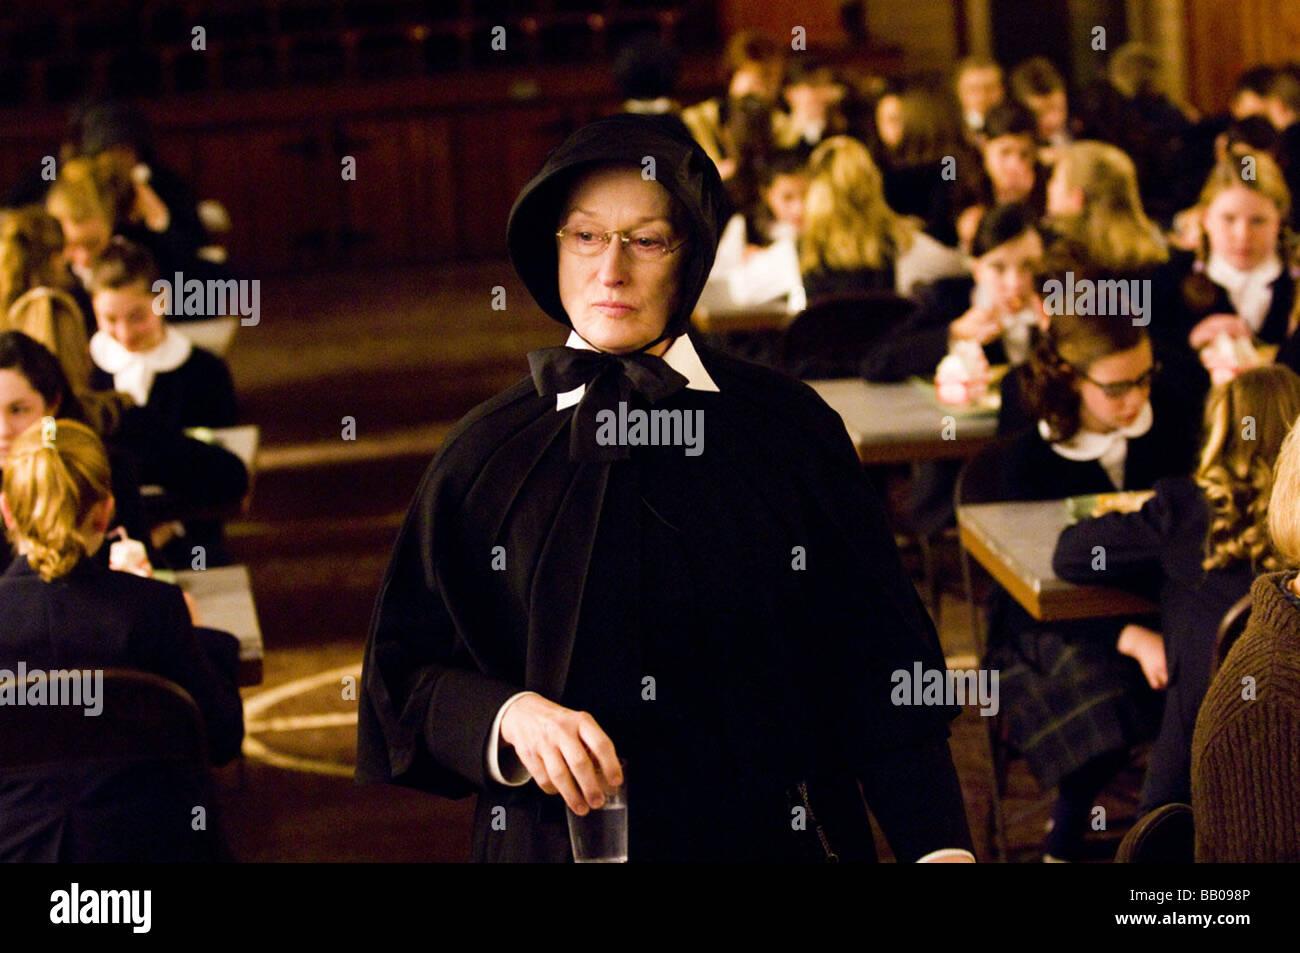 Doubt Année : 2009 Réalisateur : John Patrick Shanley Meryl Streep - Stock Image